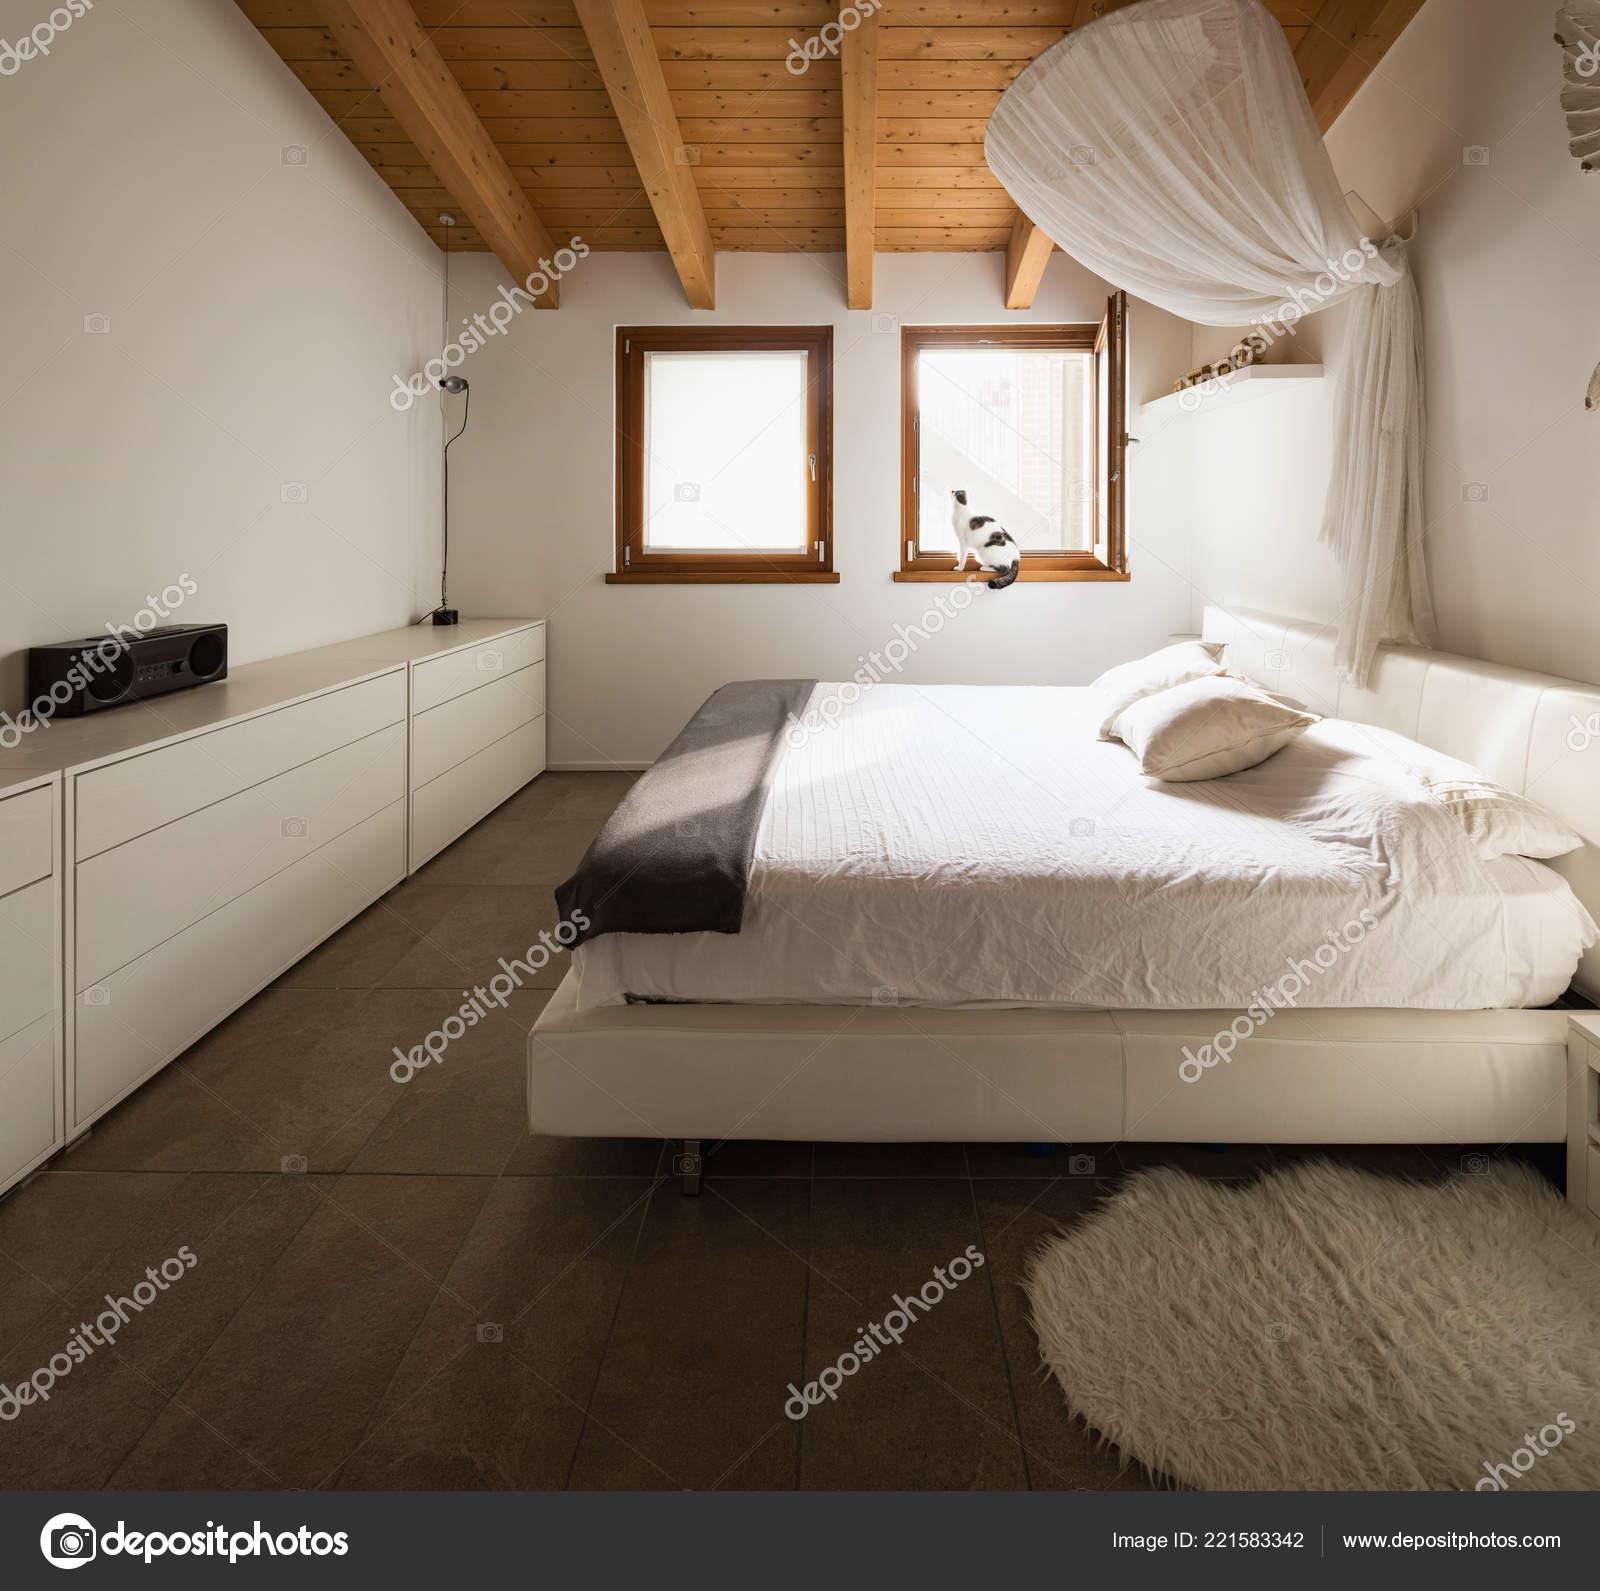 Bedroom Wooden Beams Nobody Stock Photo Image By C Zveiger 221583342